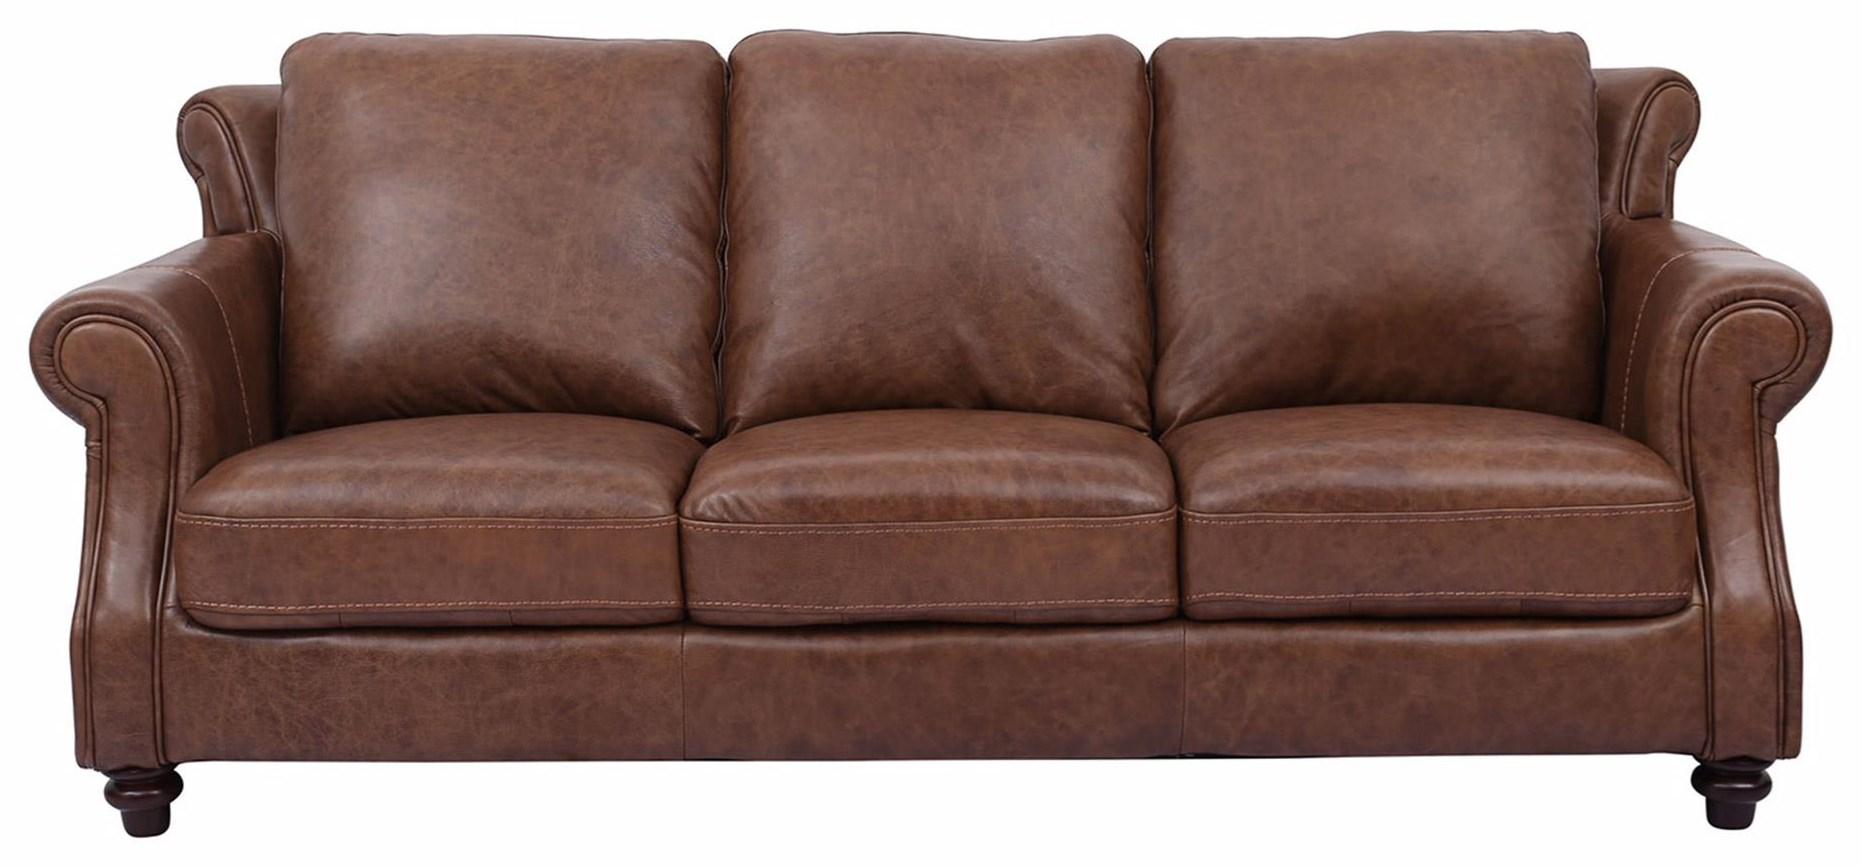 Cheers Sofa Cindy 100% Leather Sofa - Item Number: C2115-L3011346